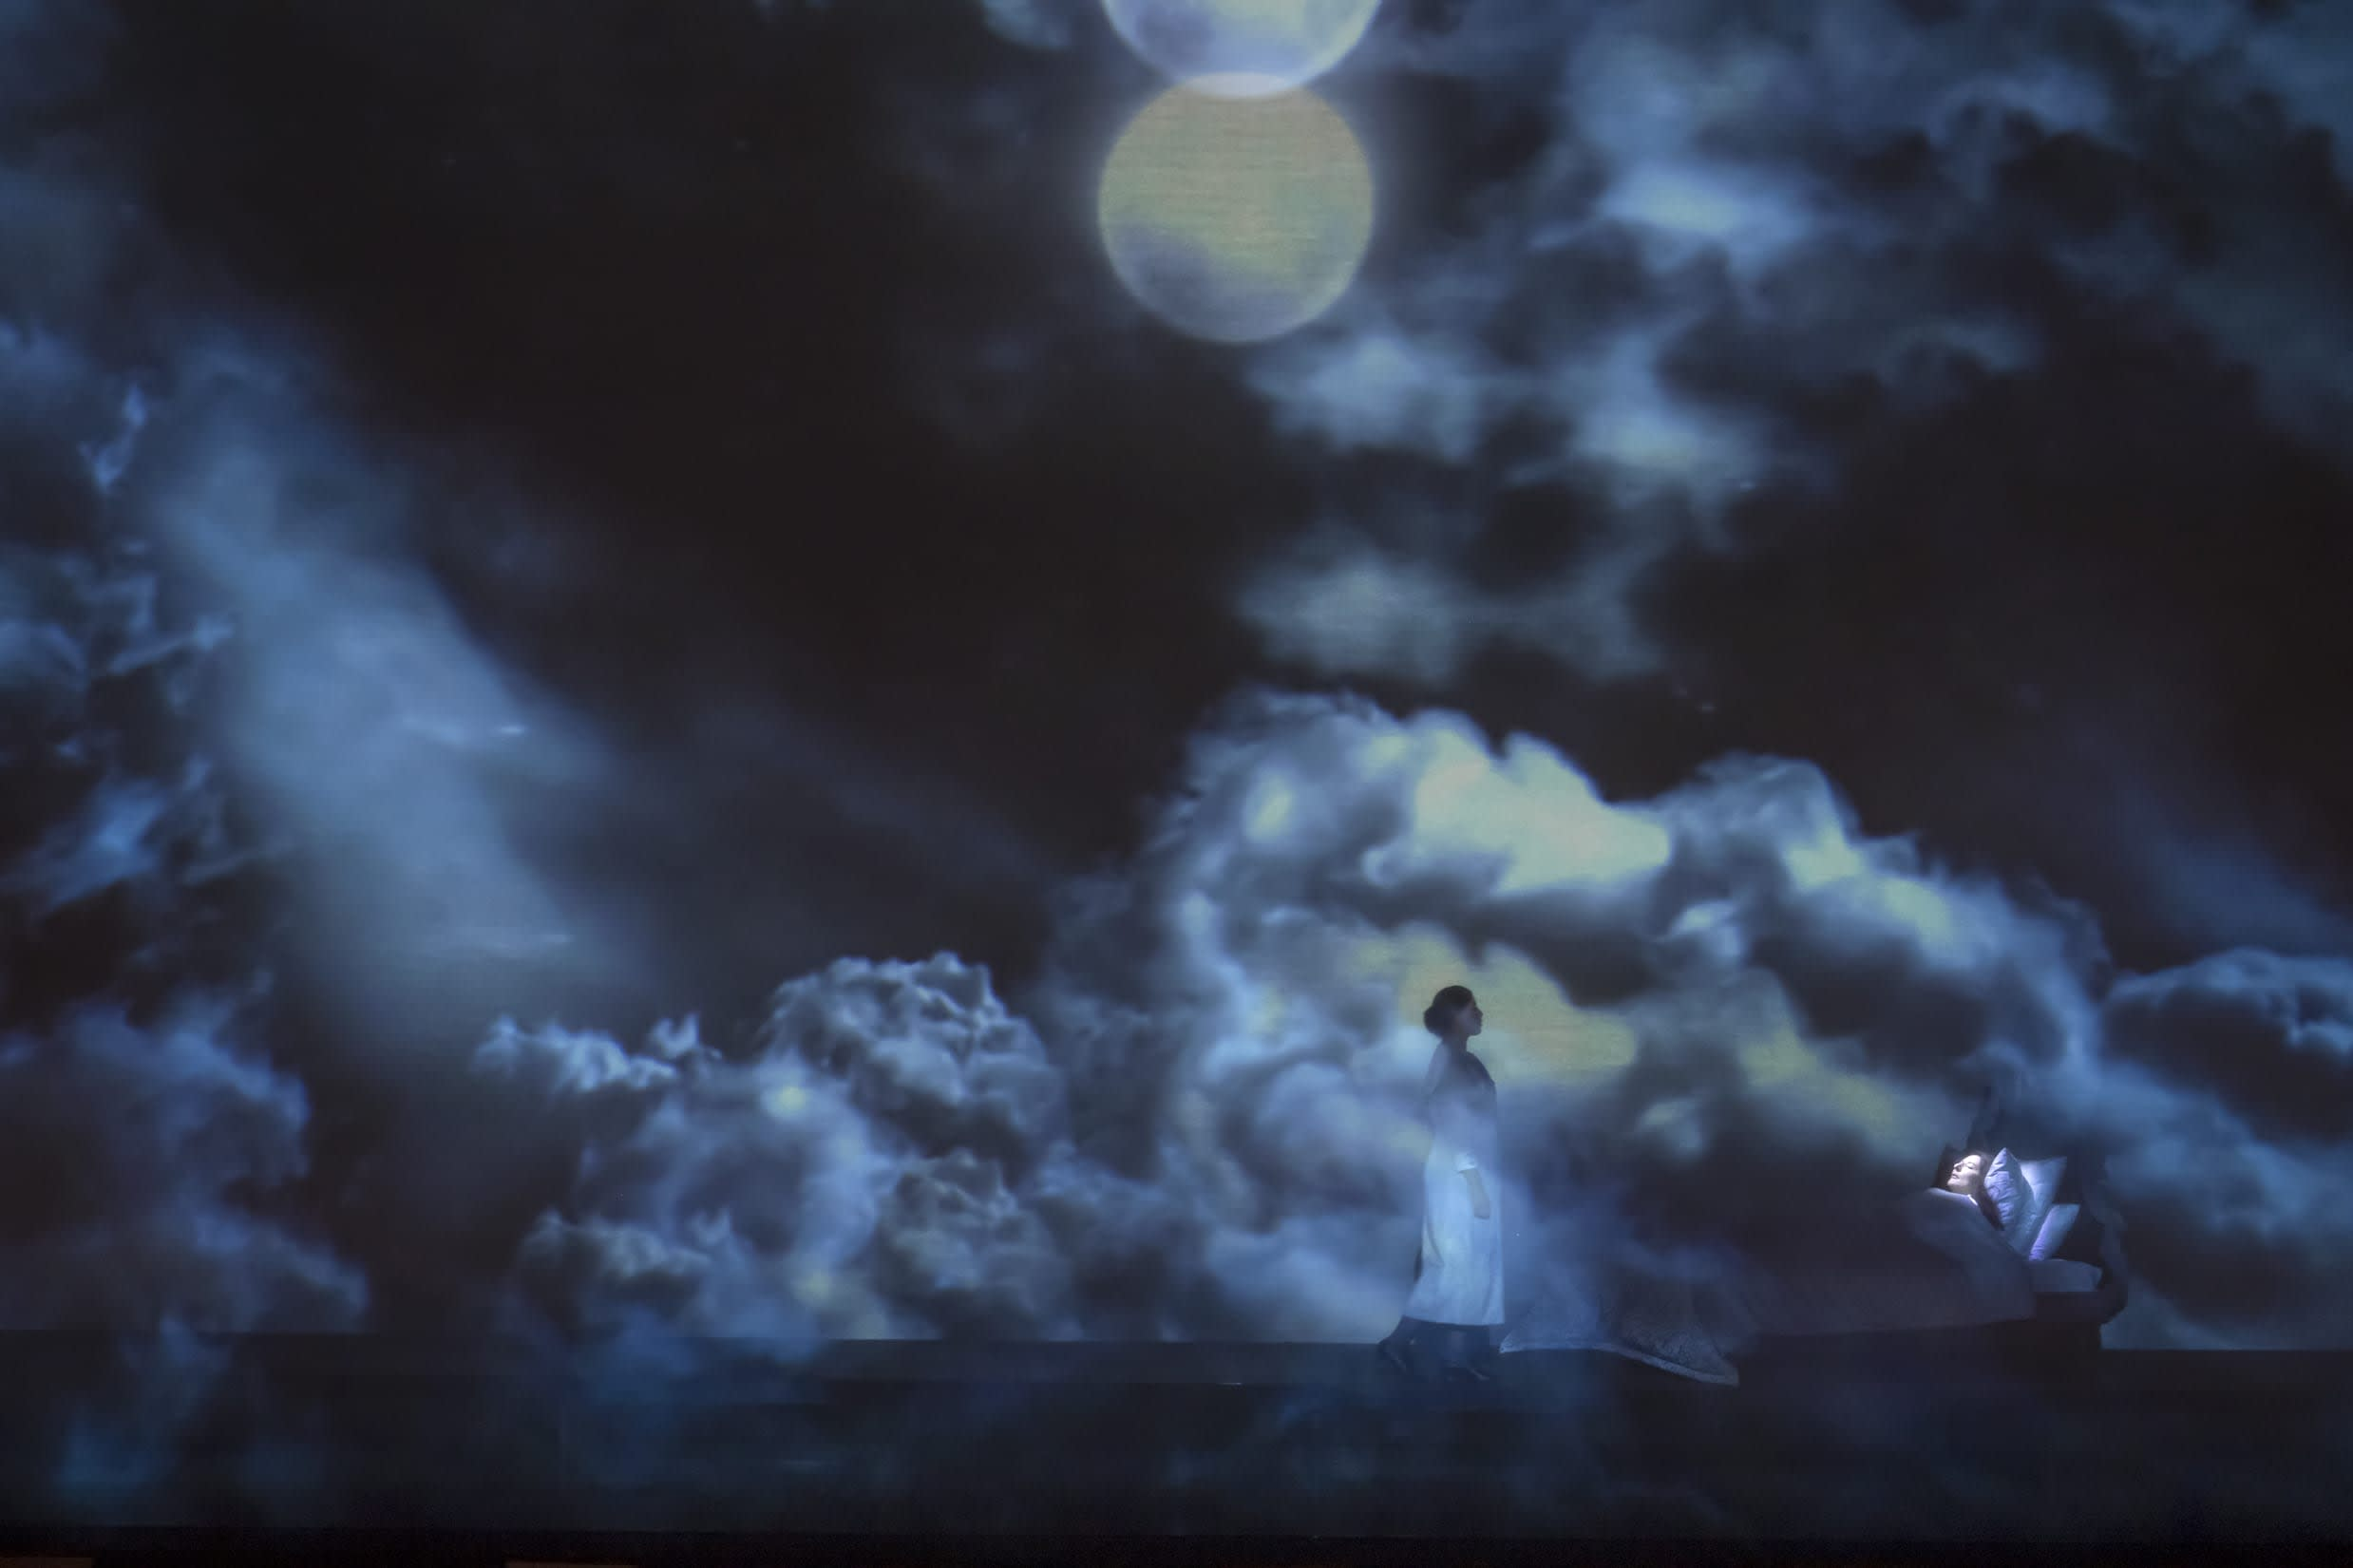 7 Deaths of Maria Callas 21-22 © Charles Duprat - OnP (18)